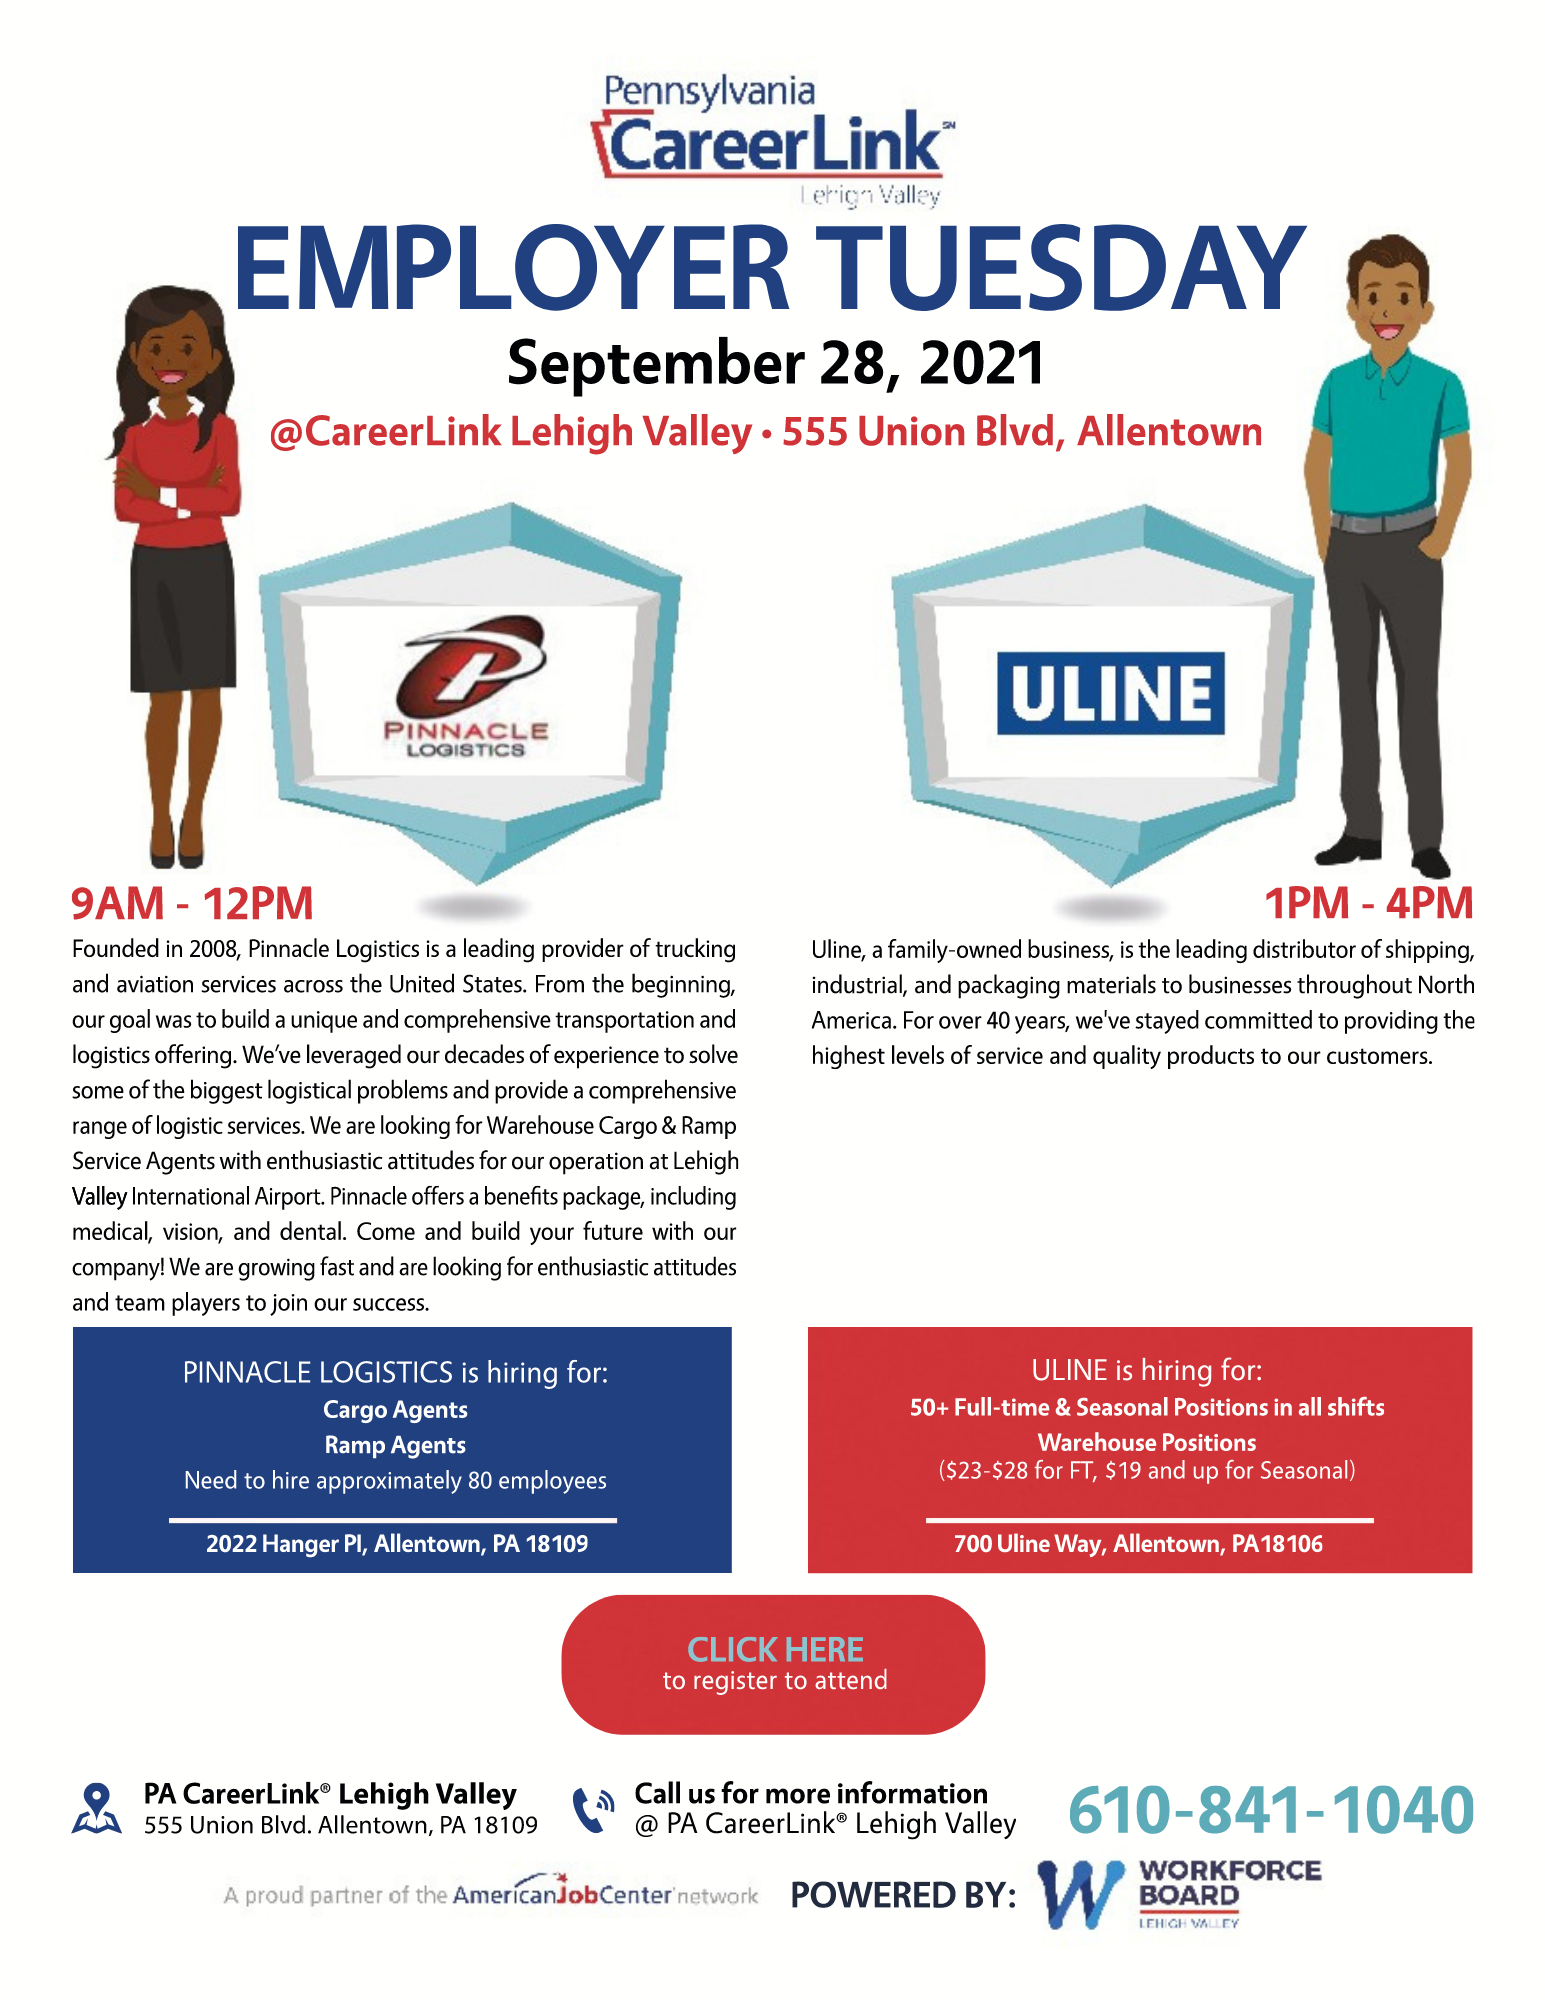 Employer Tuesday September 28 flyer